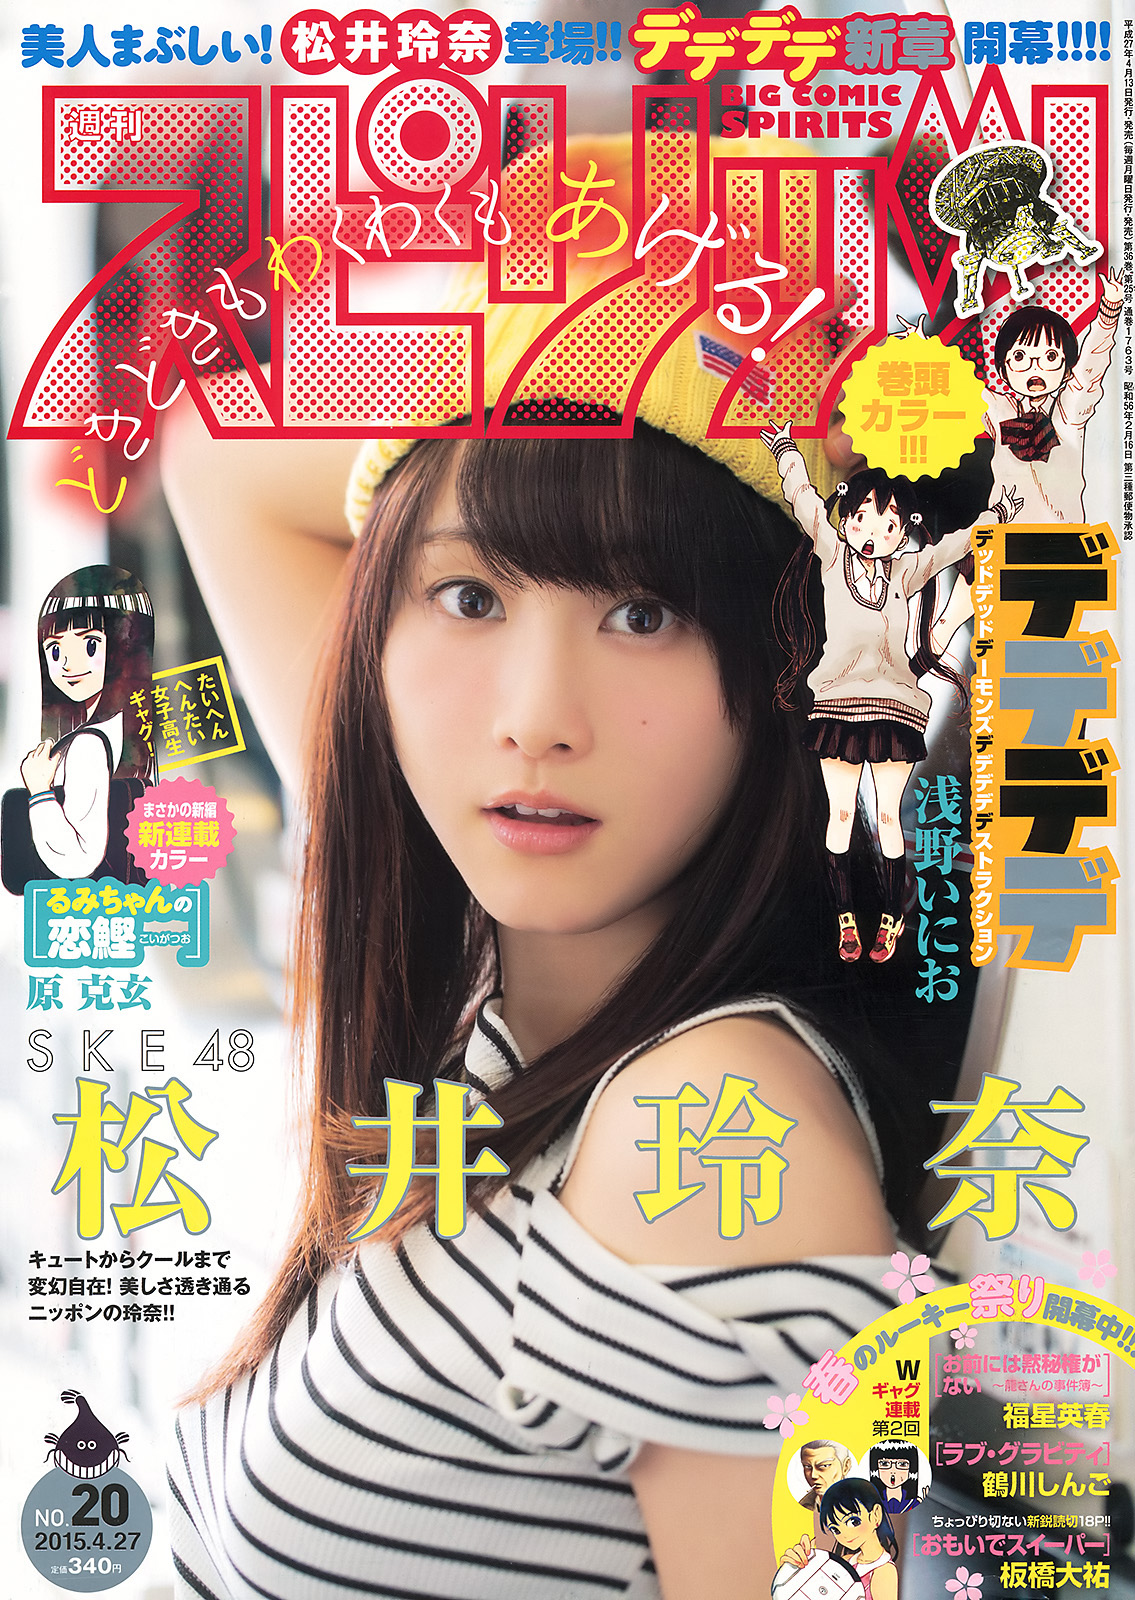 [Big Comic Spirits] No.20 Rena Matsui [2015] [4.3MB]